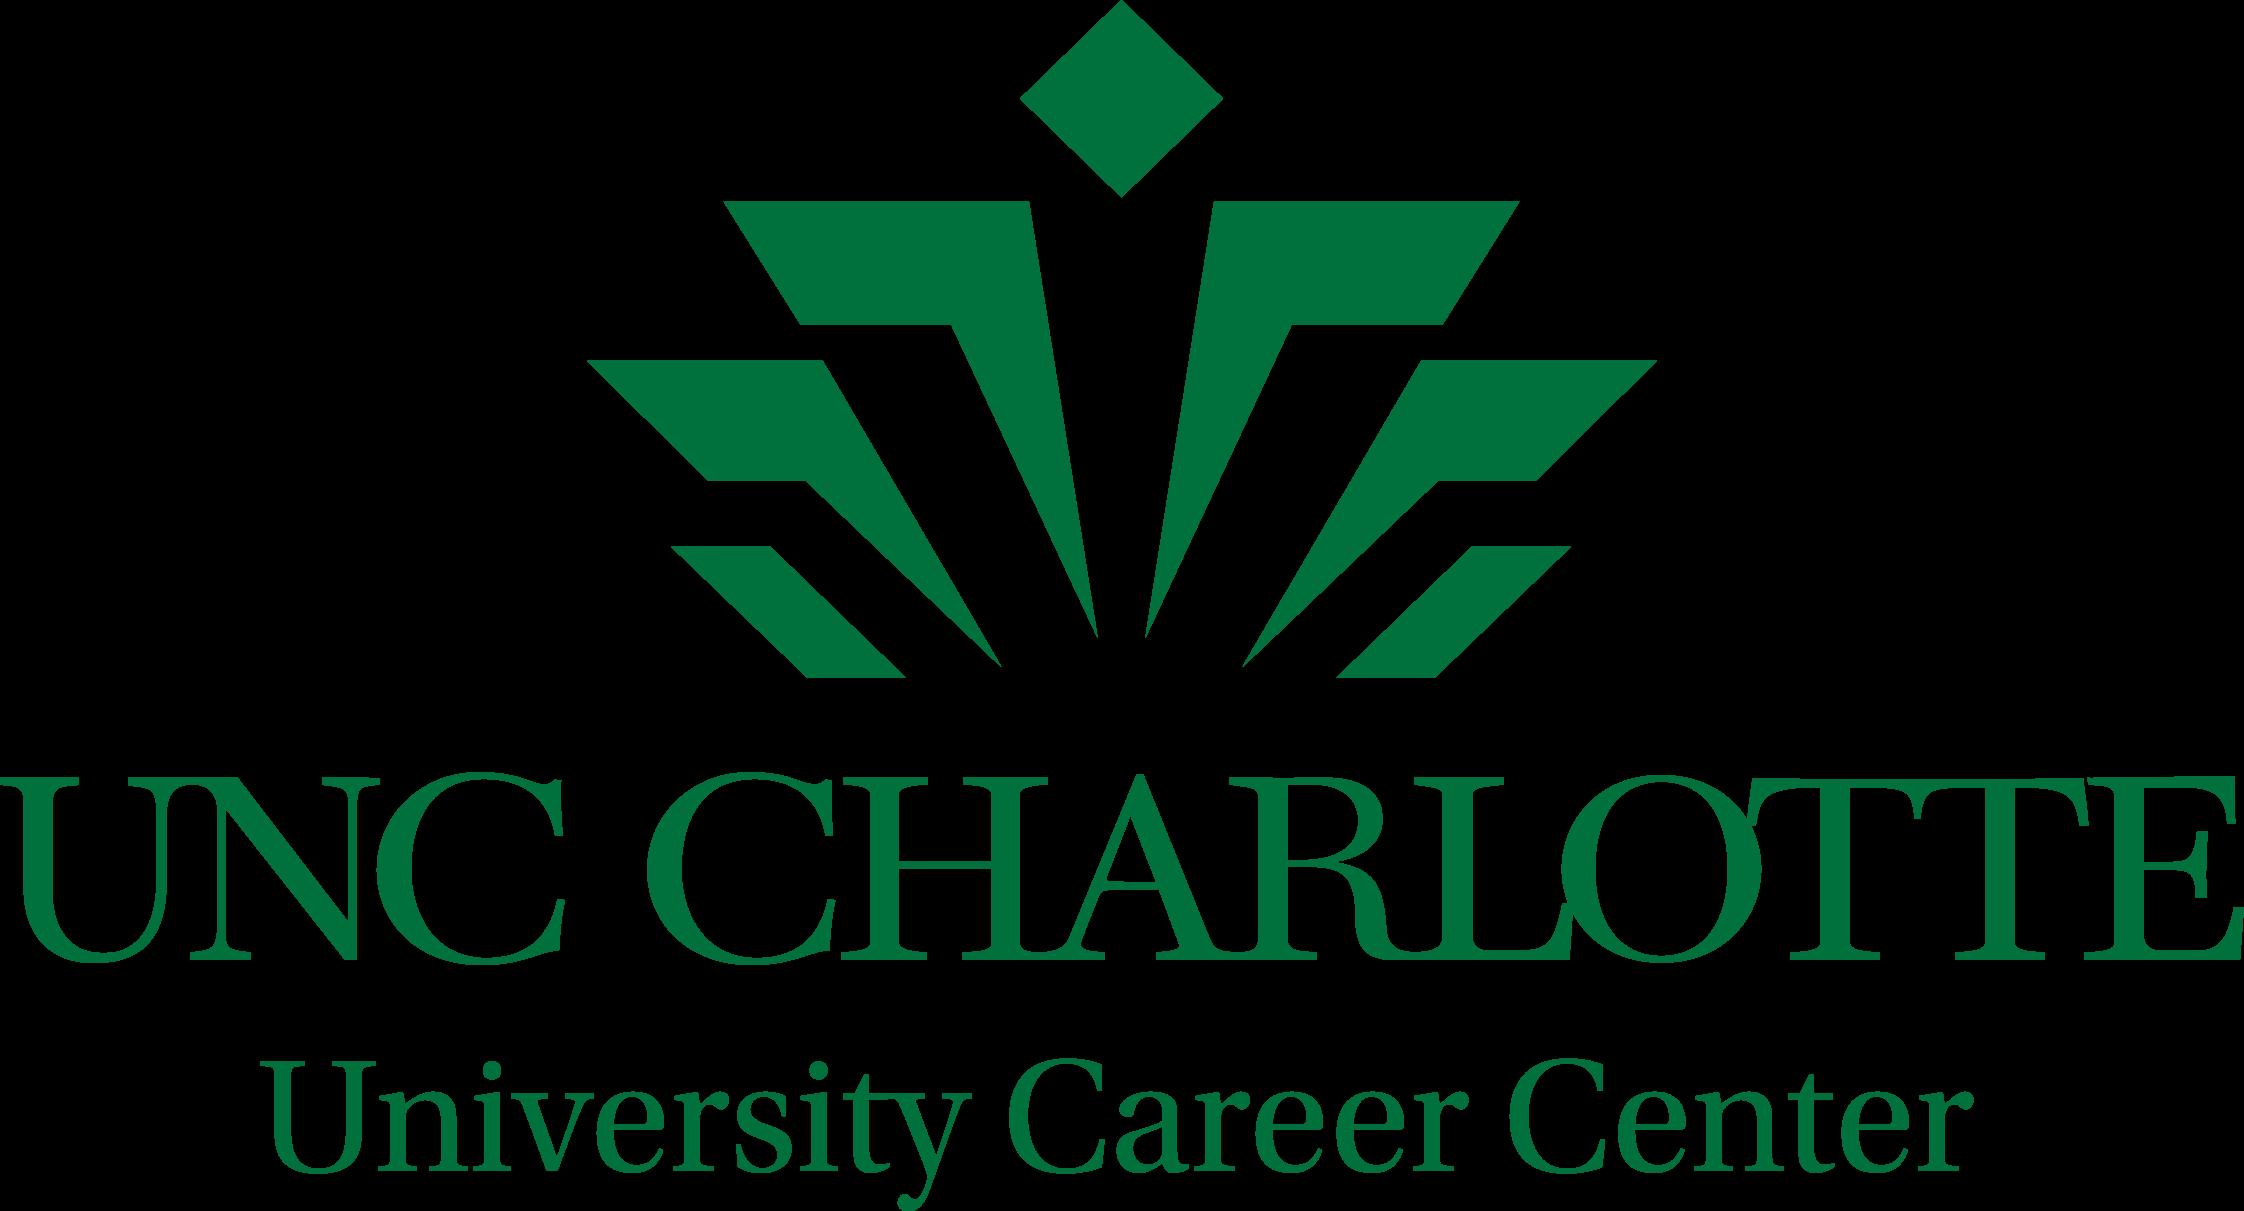 UNCC University Career Center